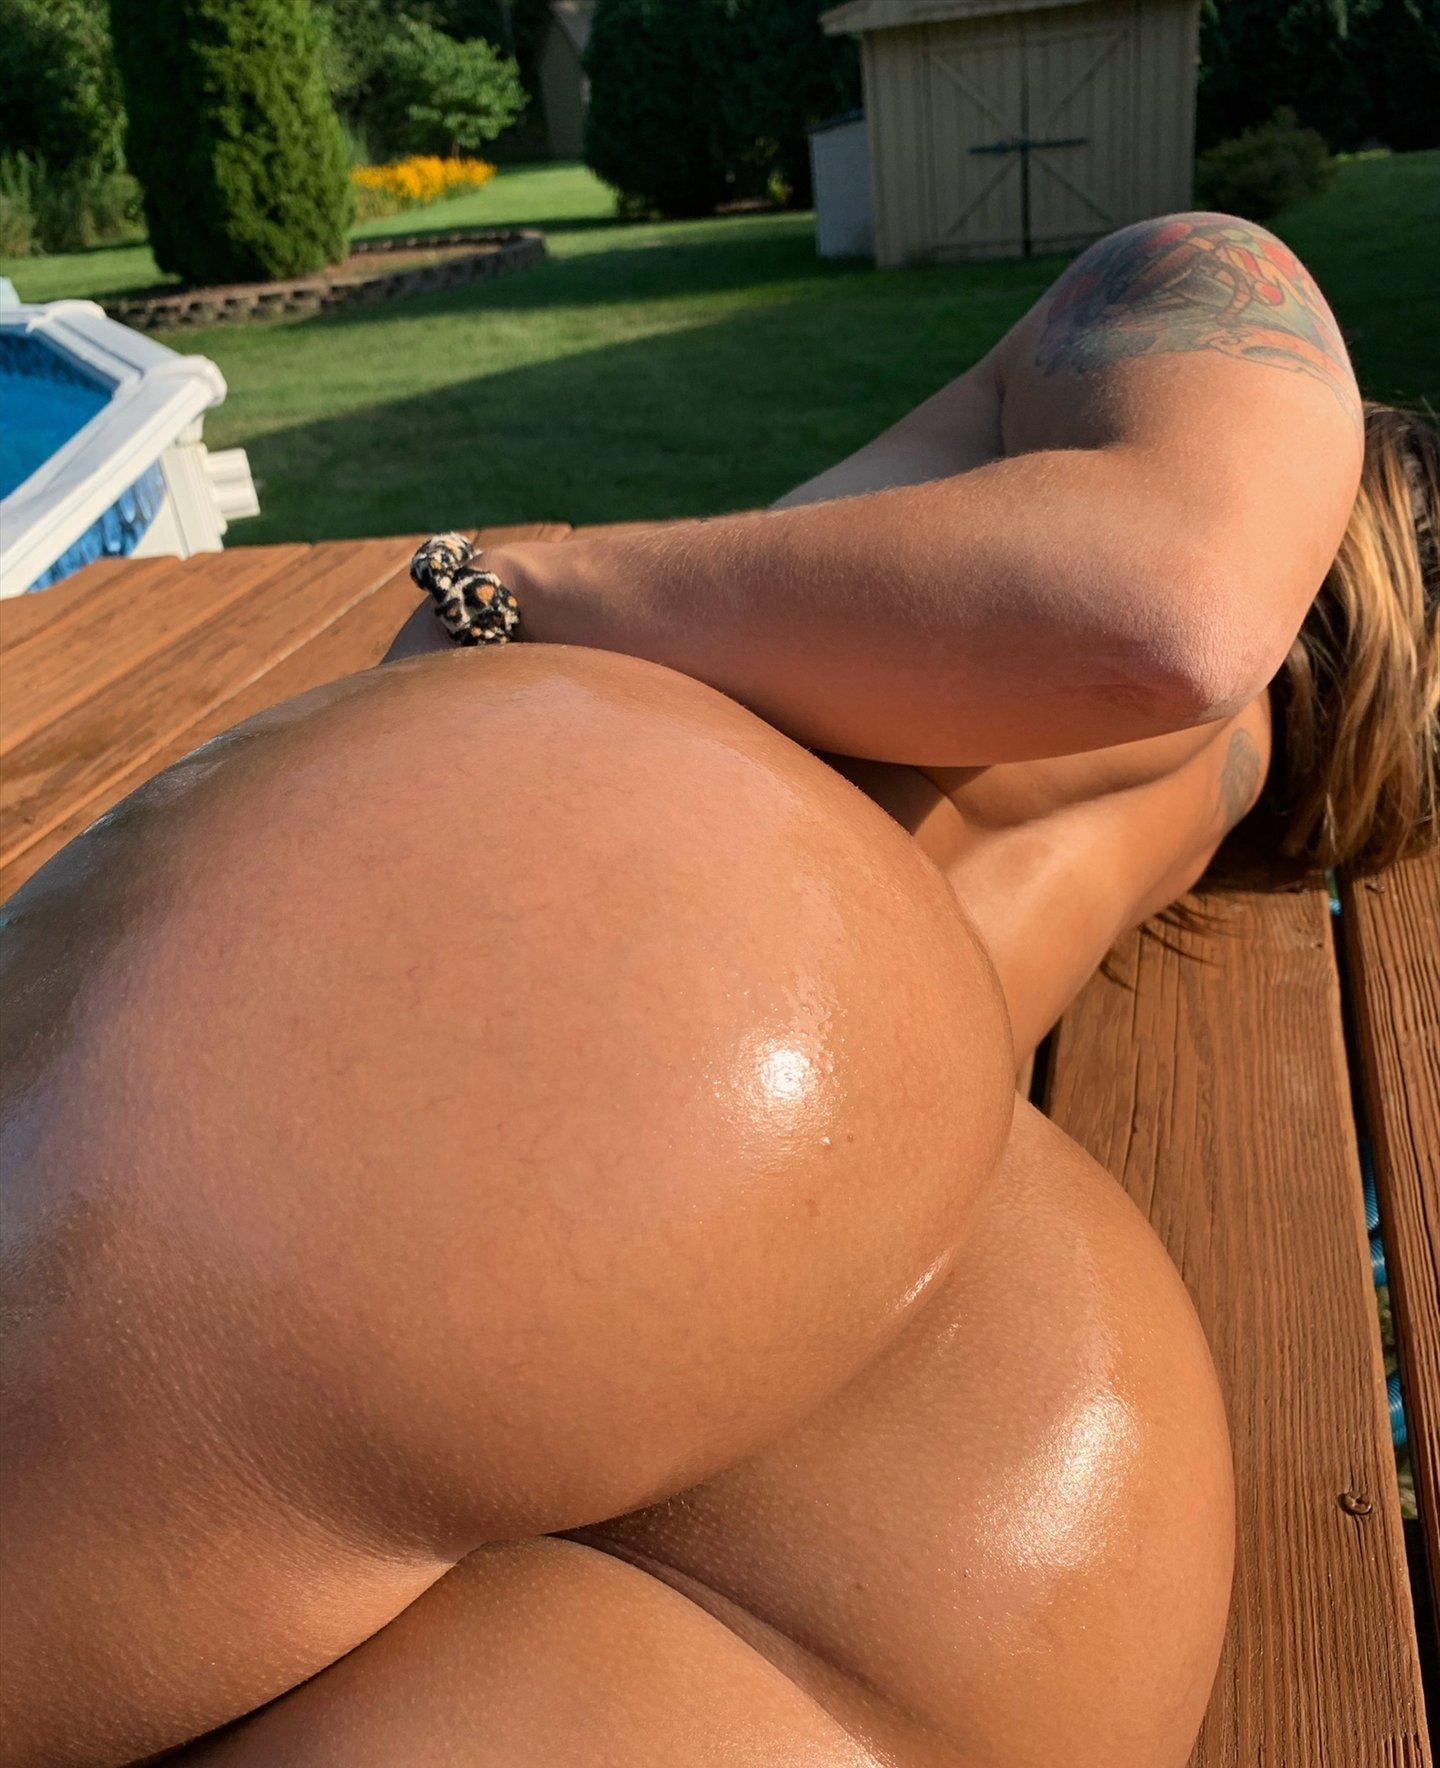 Serene Sereneazn Onlyfans Nude Leaks 0001